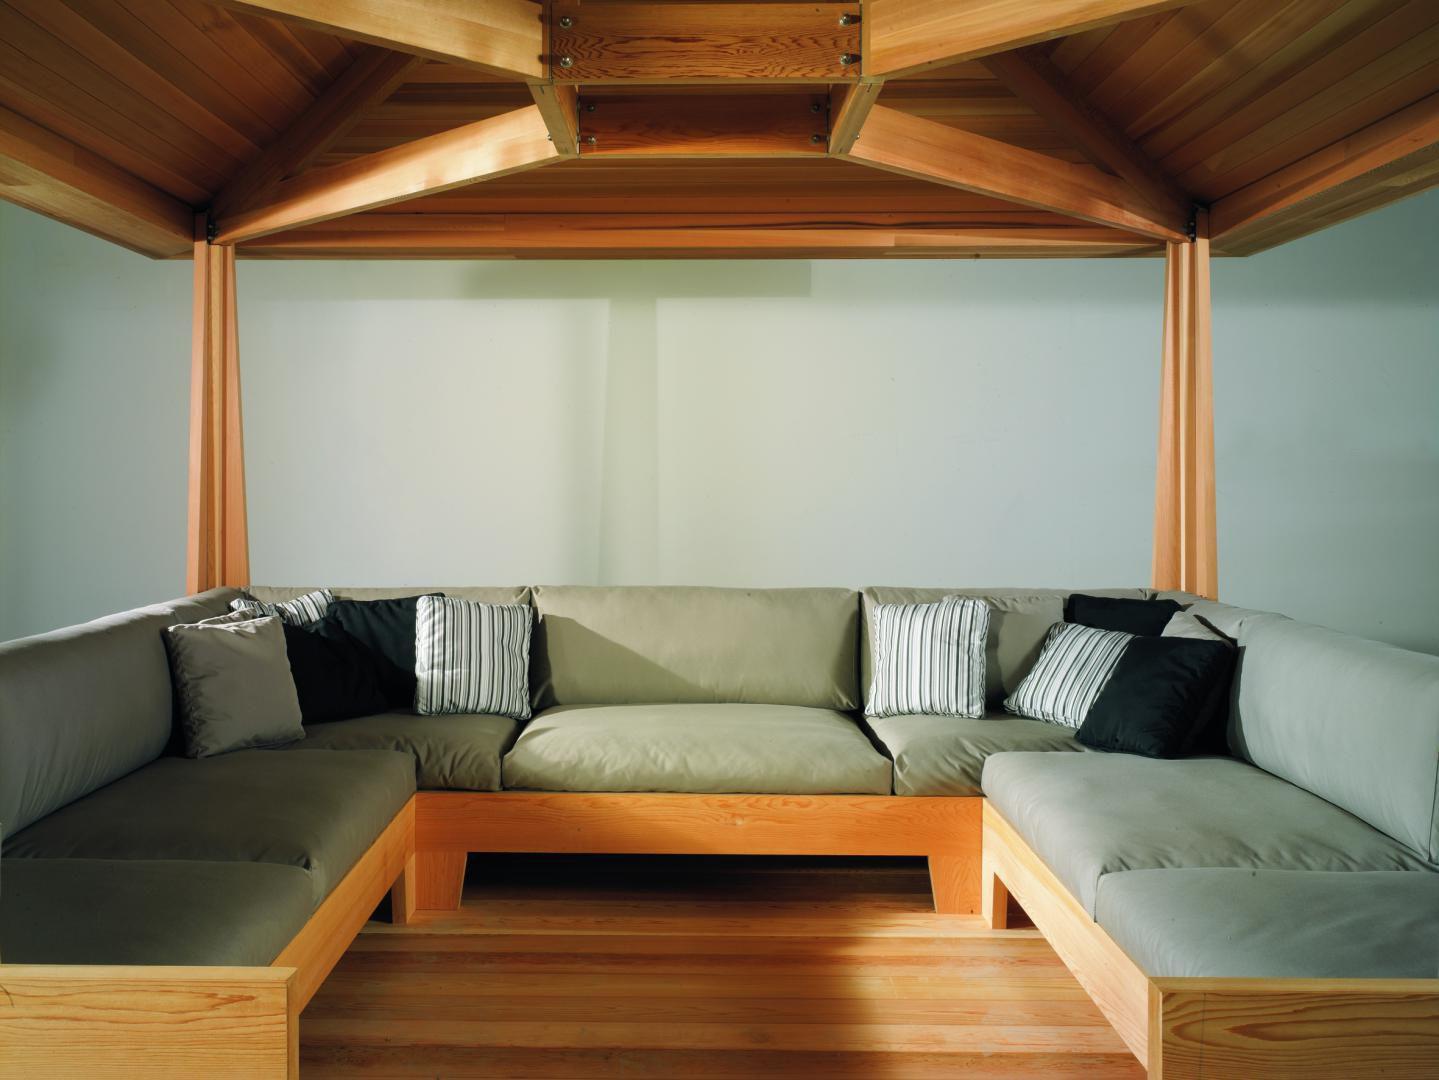 Red cedar gazebo - TEA HOUSE by Paolo Bonazzi - EXTETA on cedar shed design, cedar home design, cedar greenhouse design,